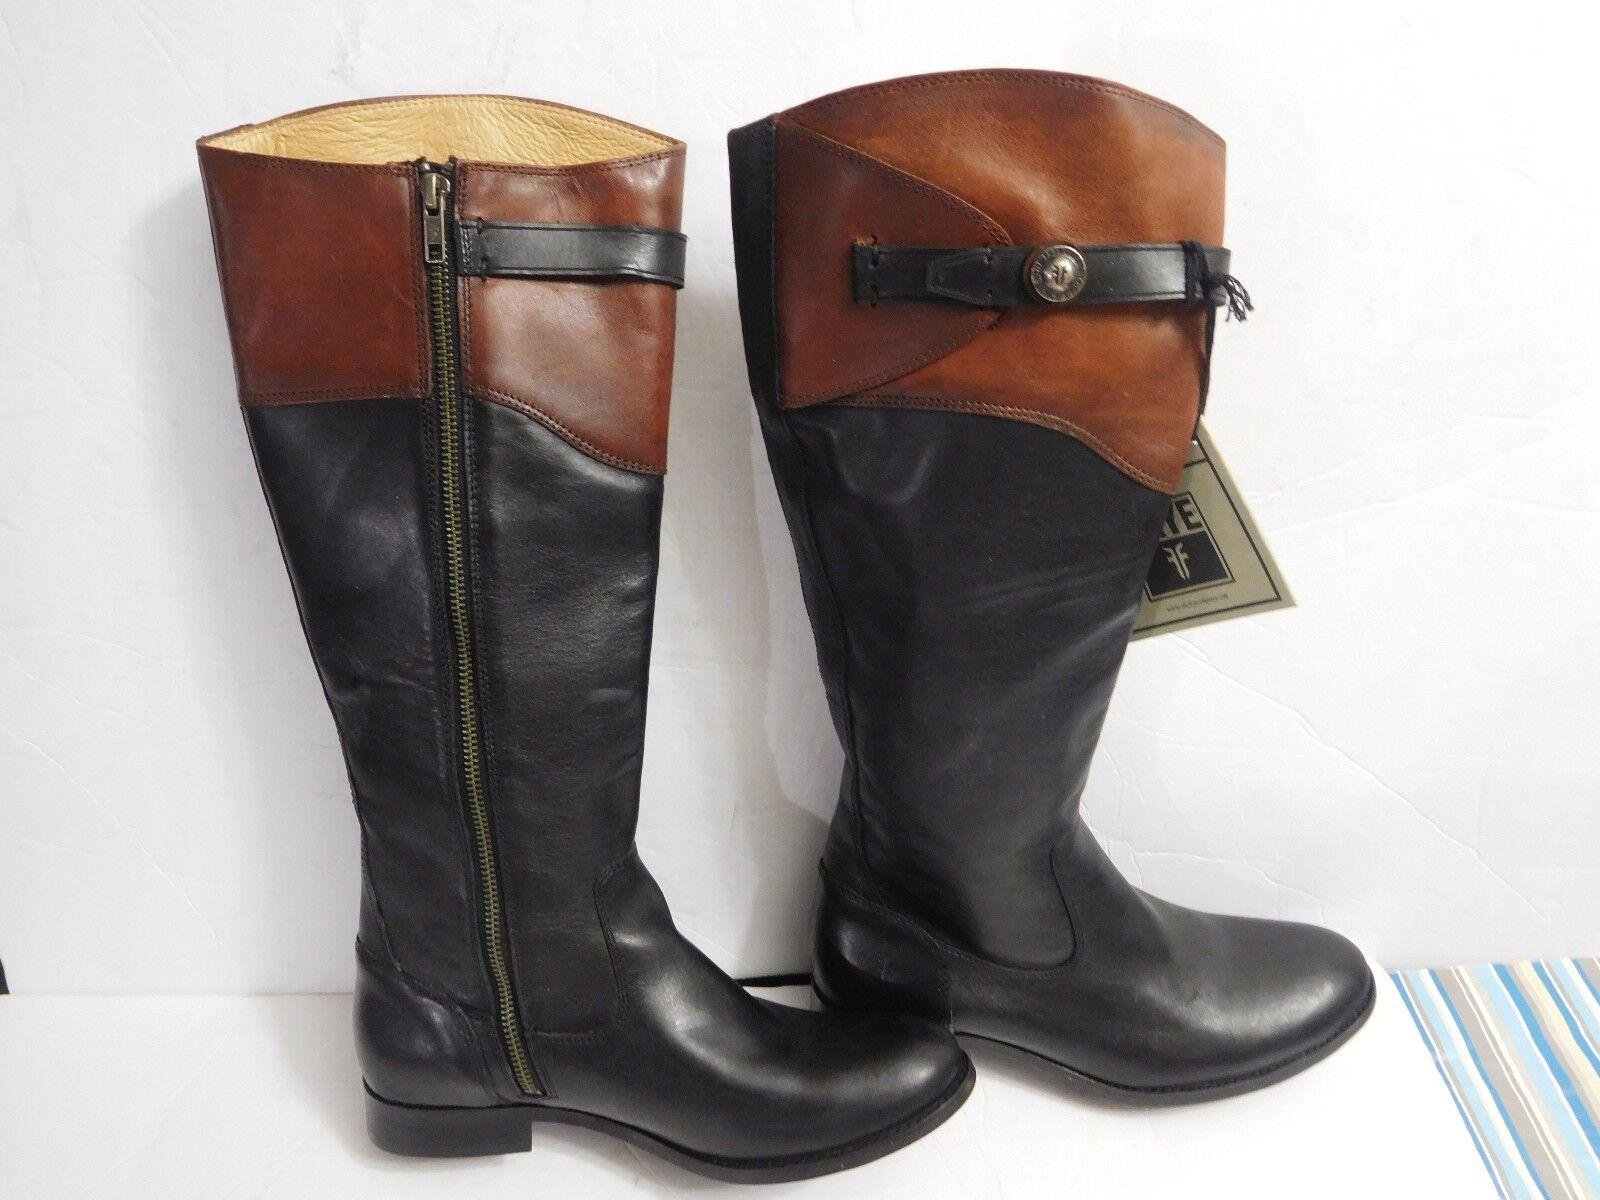 B-251 Women's Frye 'Molly Button' Tall Leather Riding Boots (Women) Sz 8 1/2 B